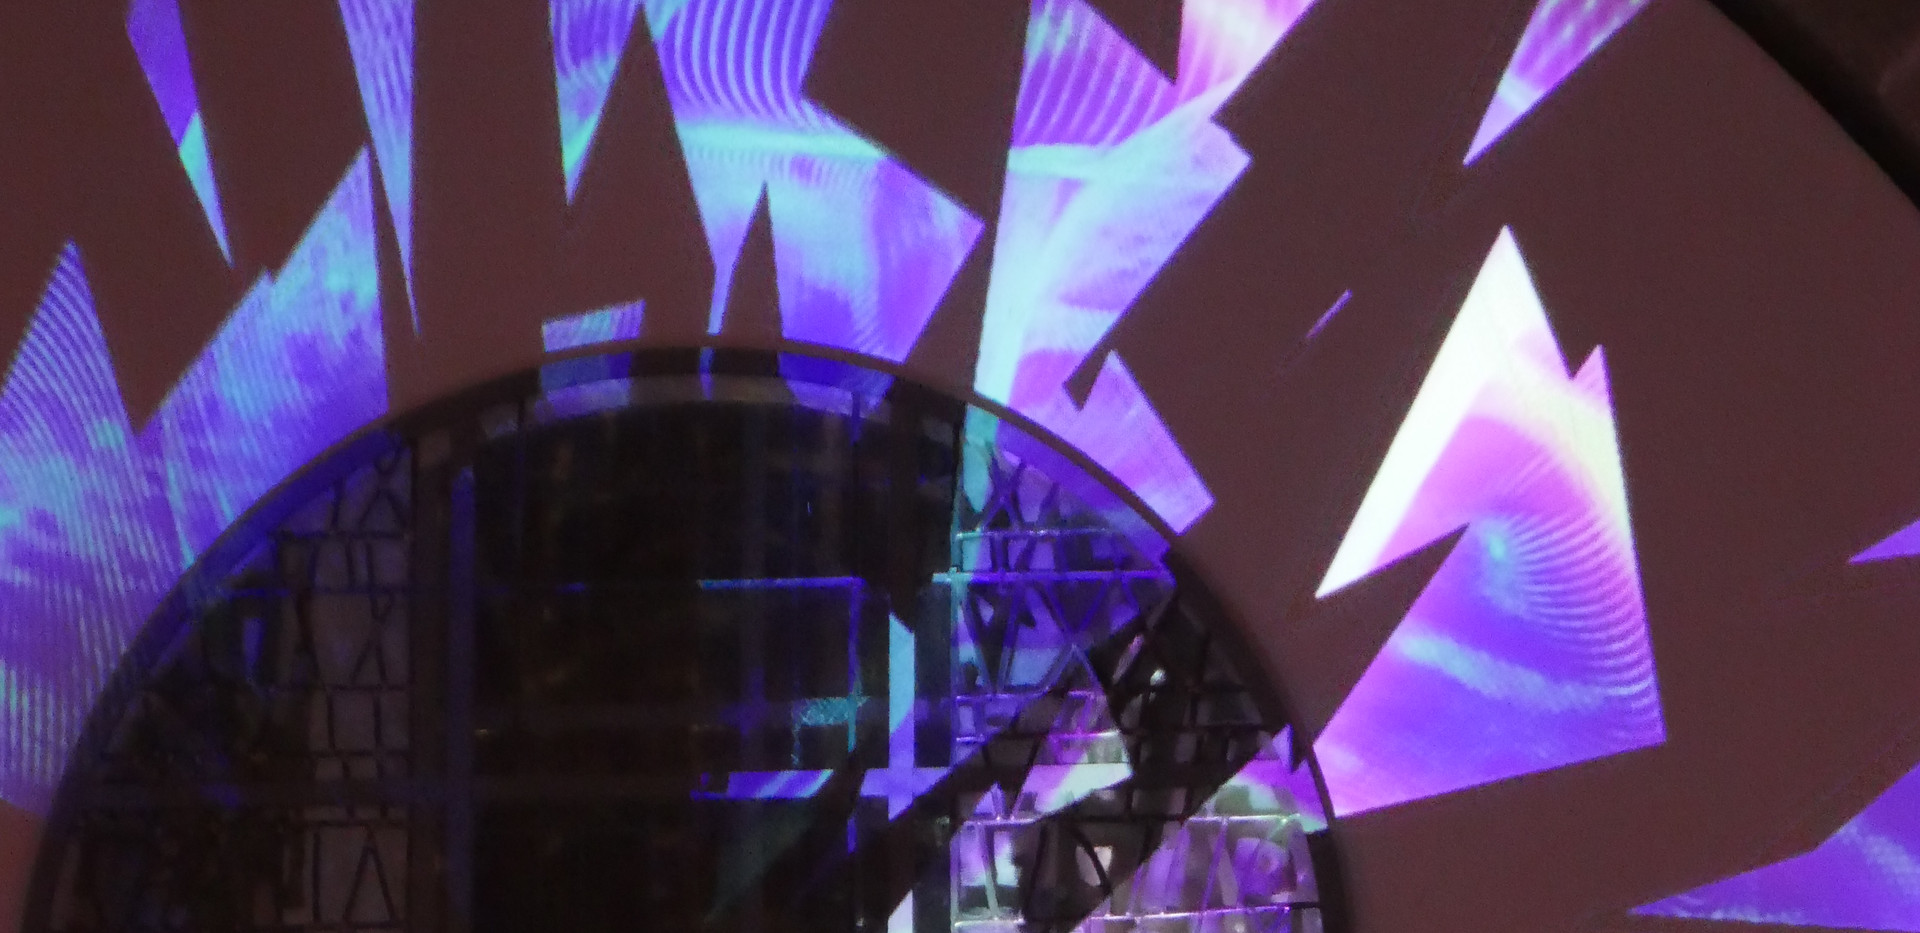 21.09.18, Festival _Les vibrations de Bo